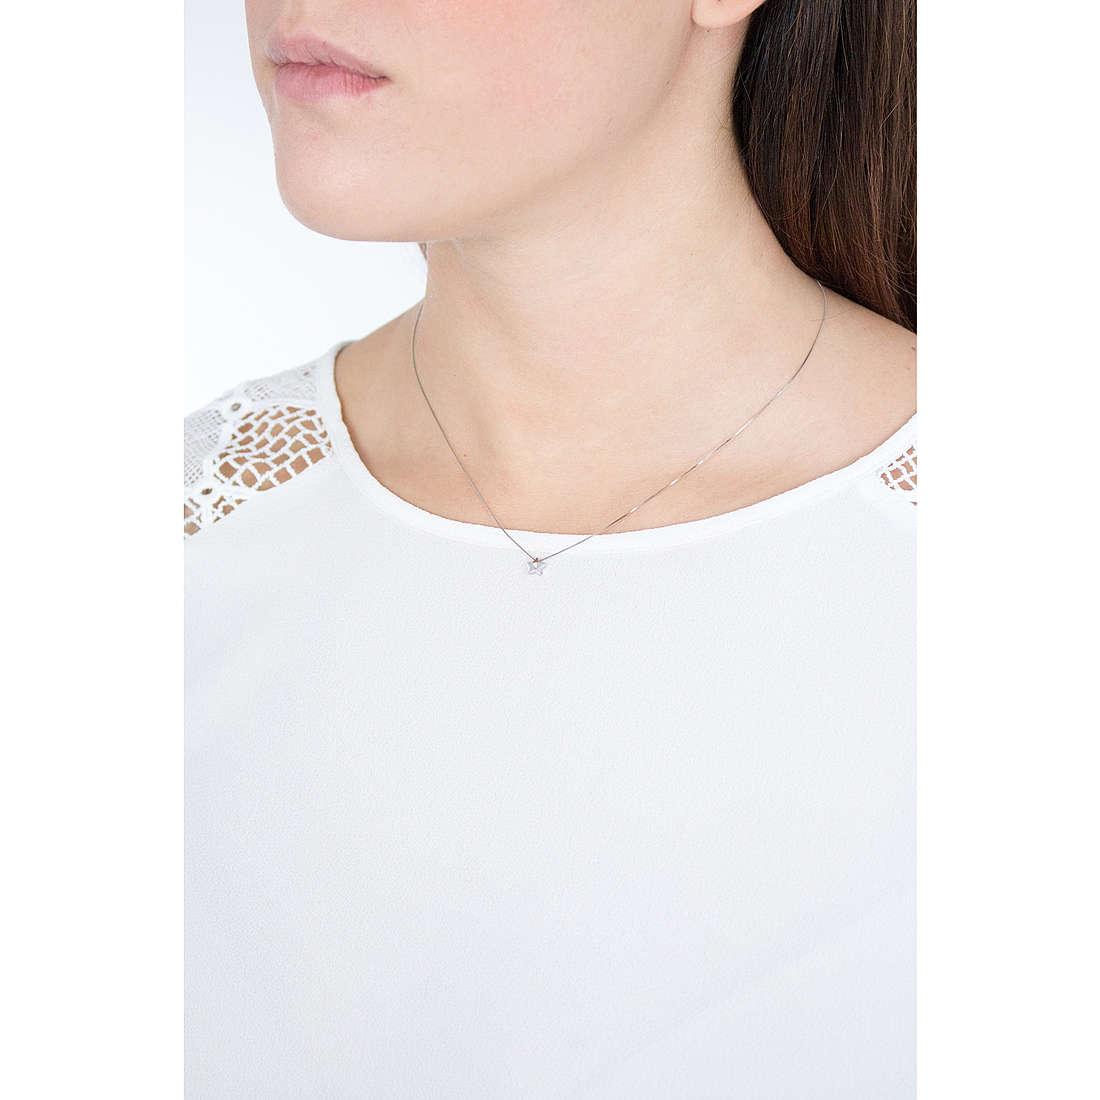 Comete colliers Cerimony femme GLB 1264 indosso